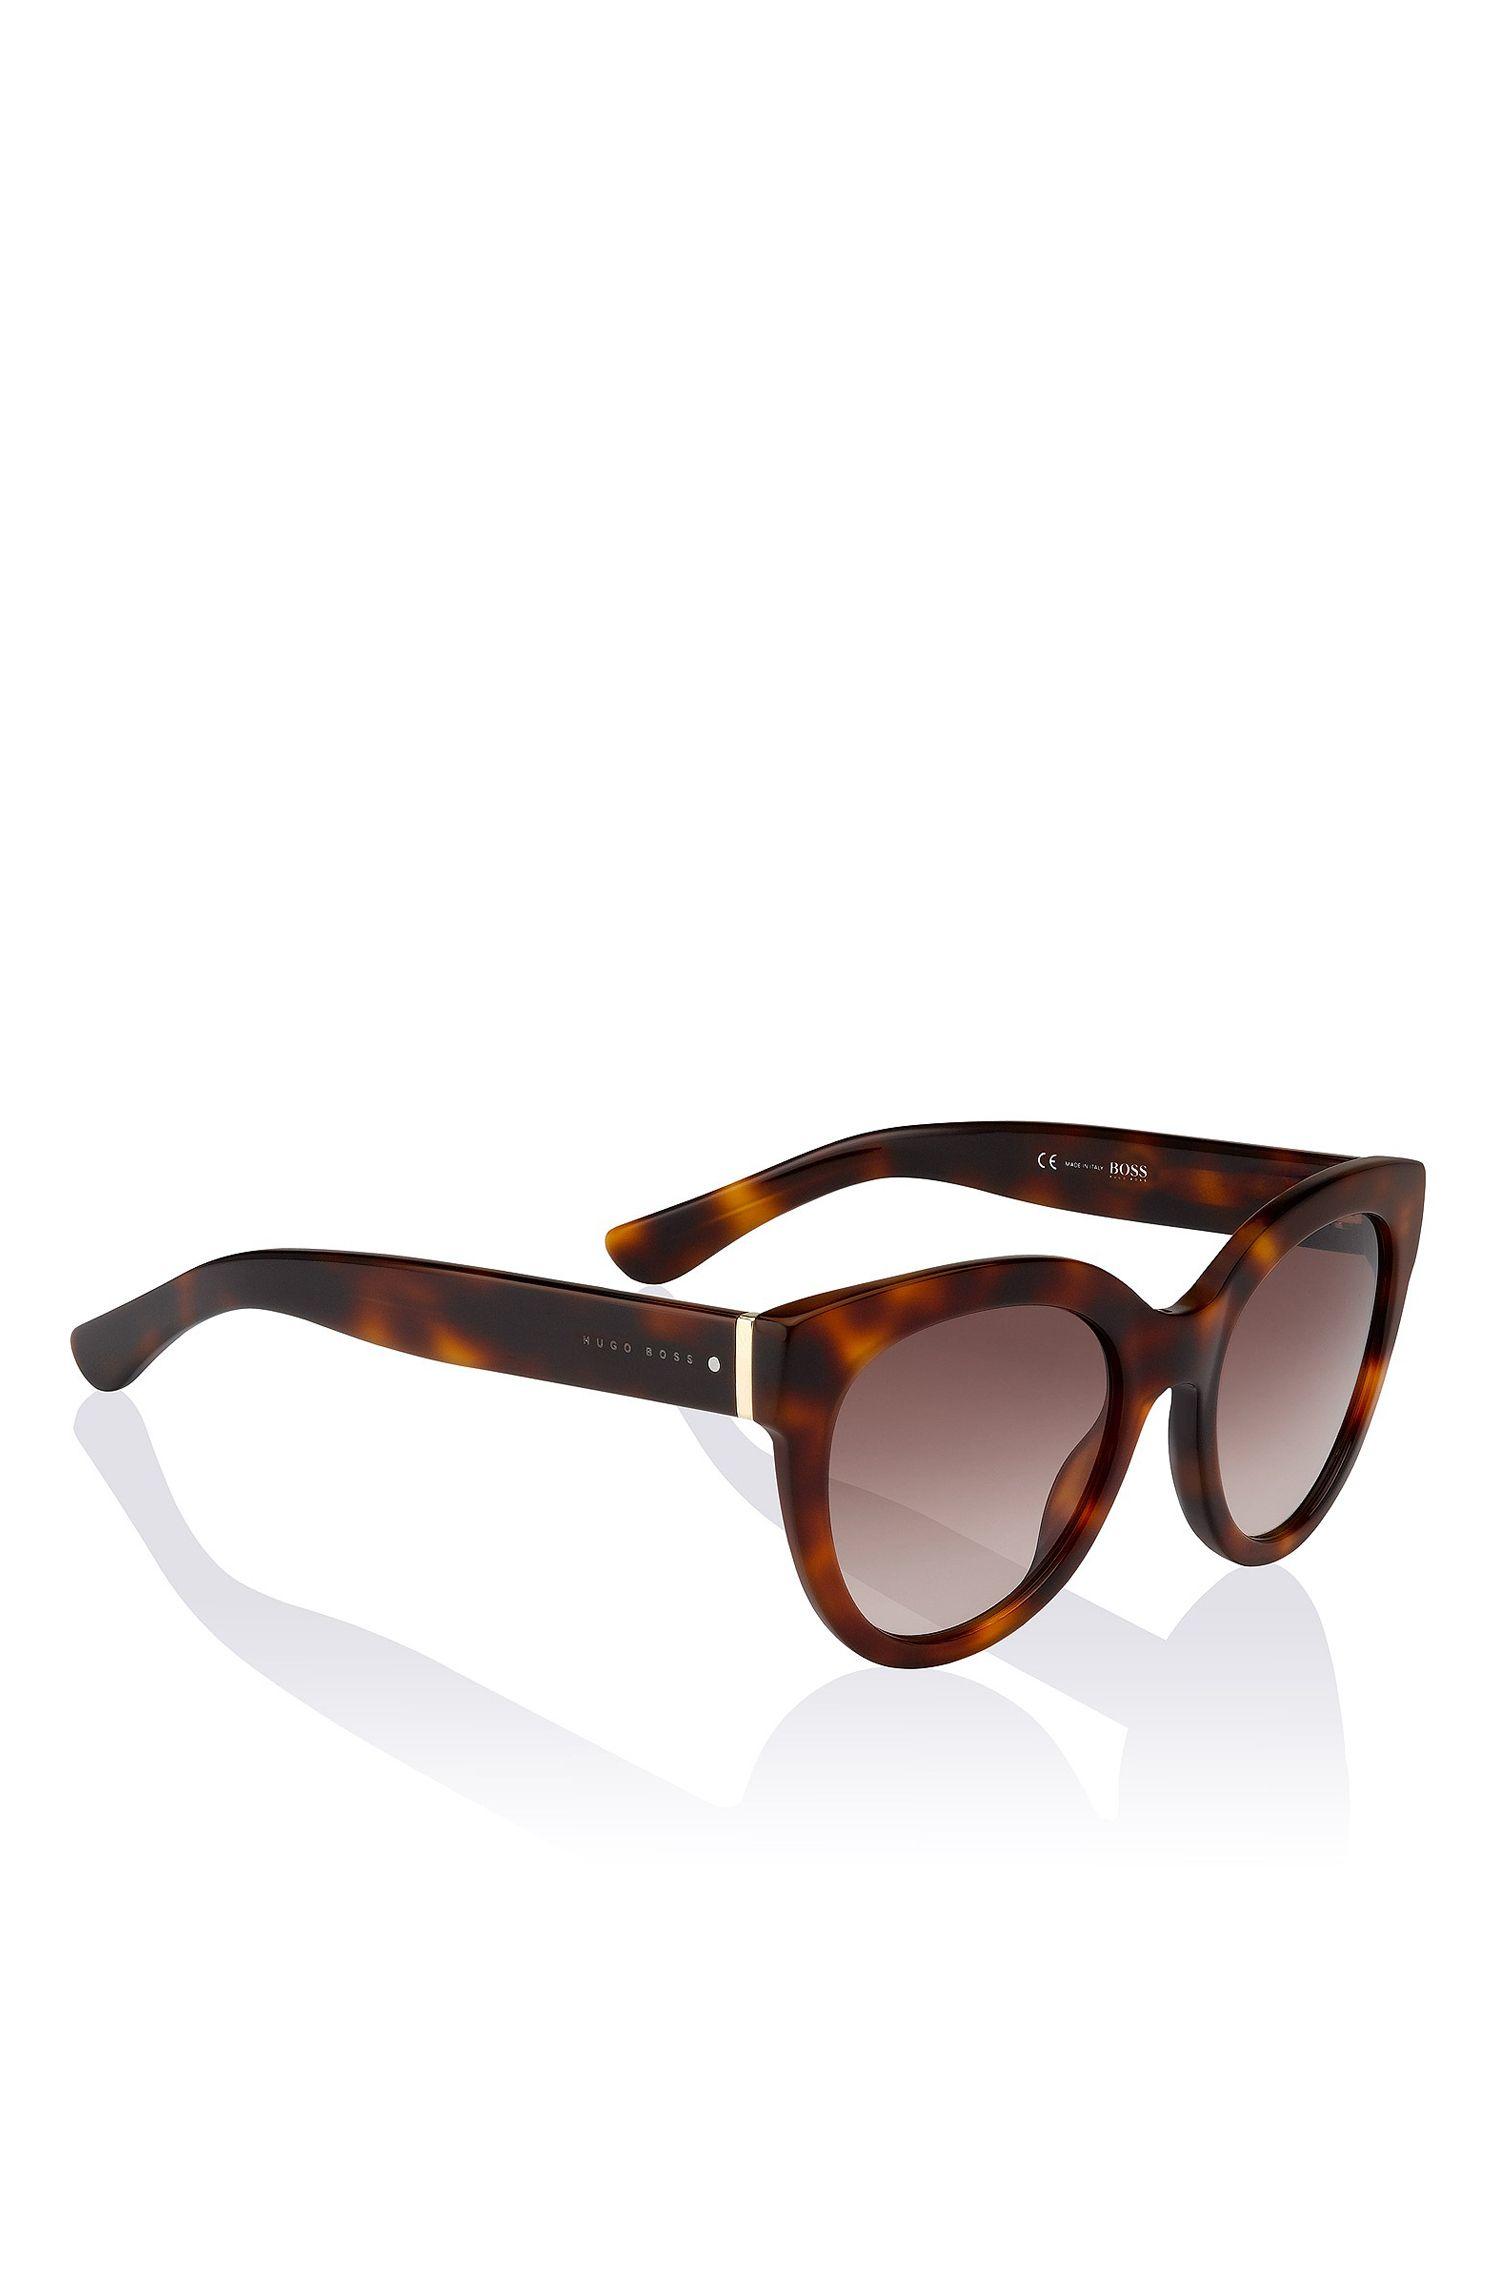 Gradient Lens Cateye Sunglasses | BOSS 0675S